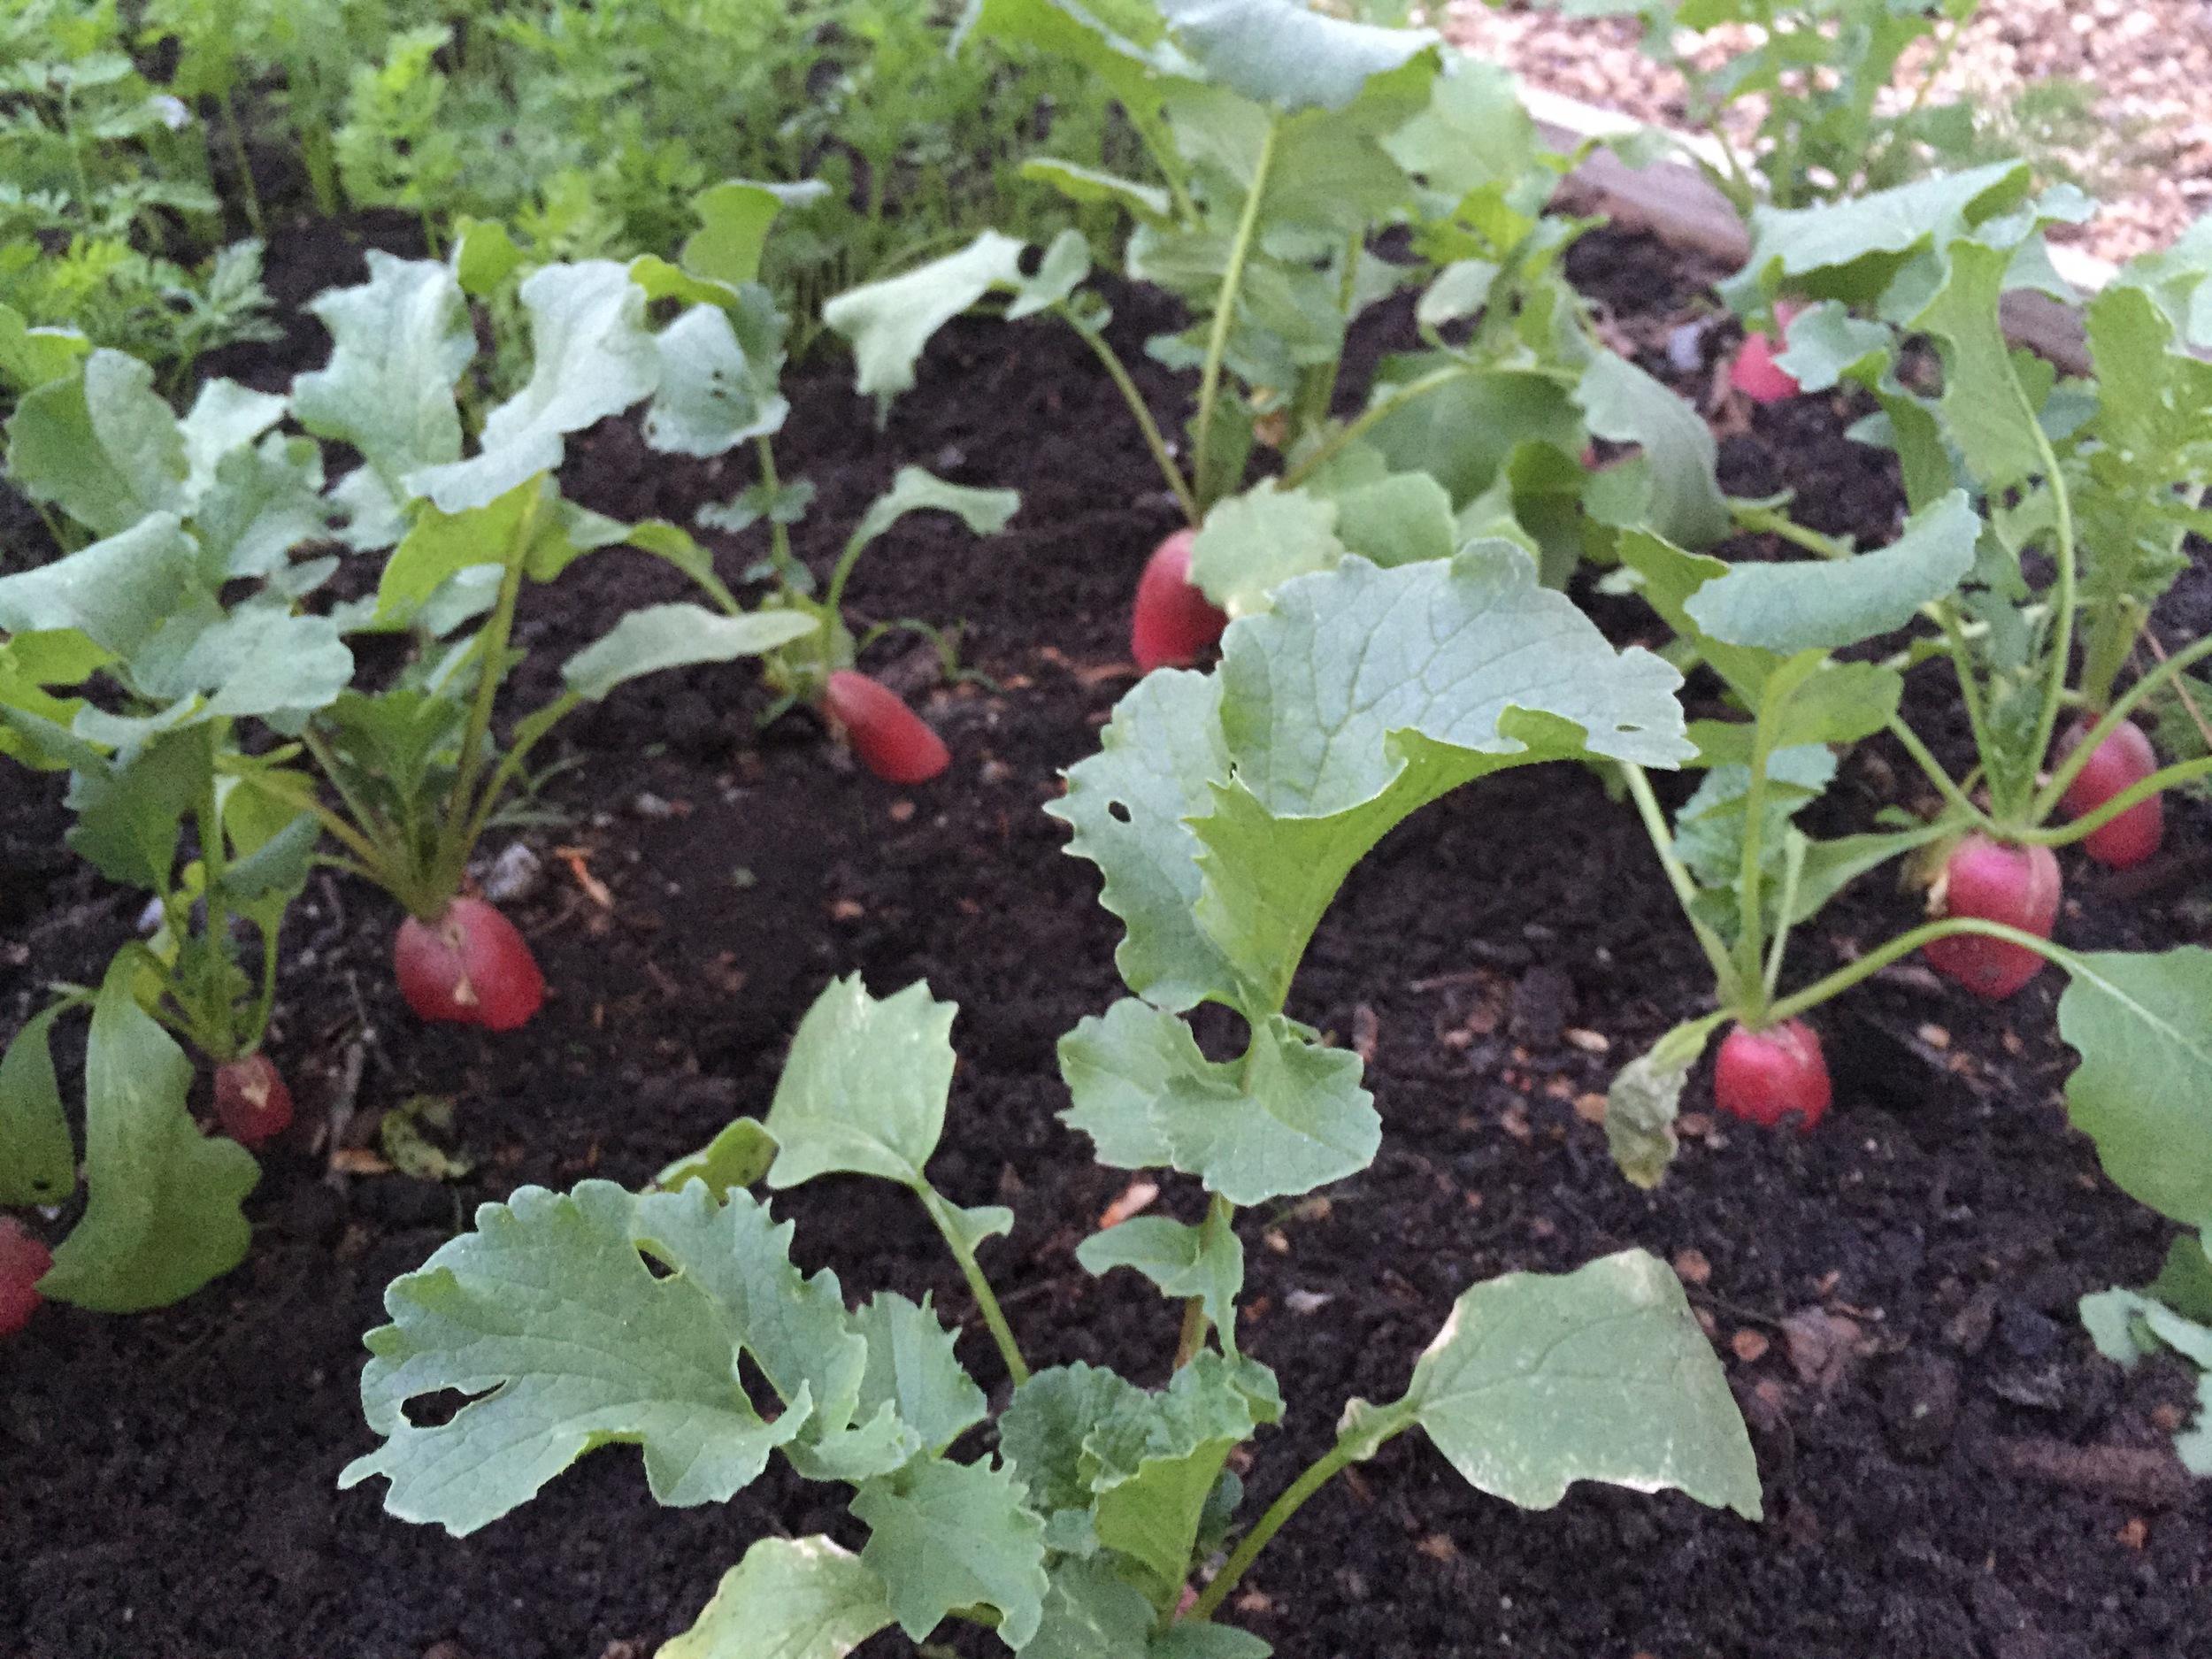 English breakfast radishes ready for harvesting